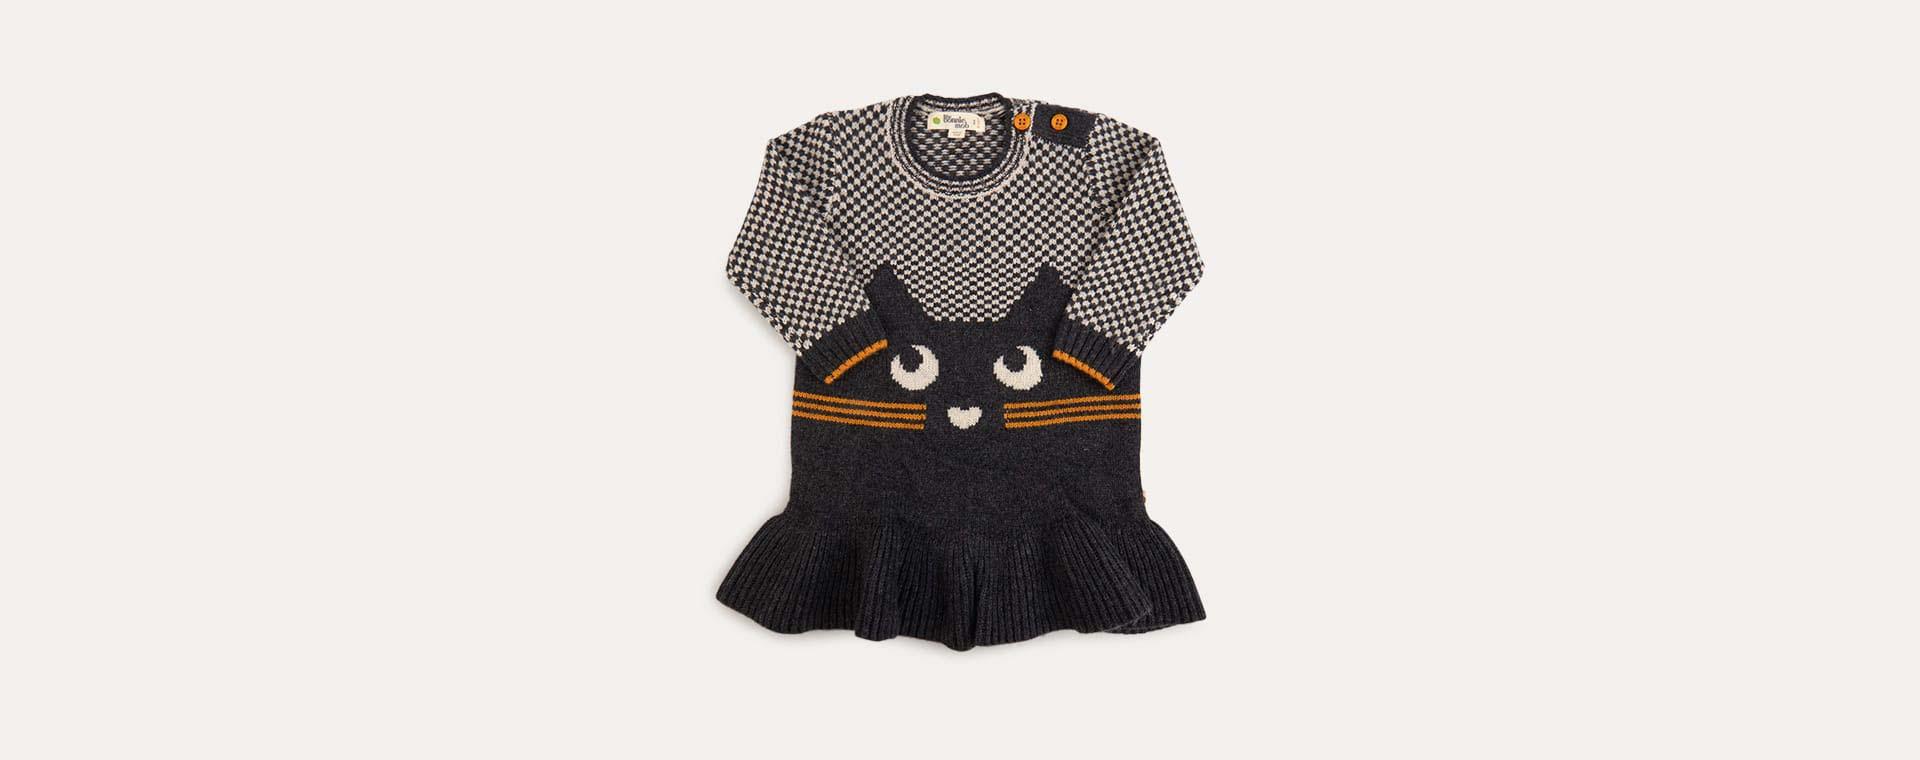 Grey The Bonnie Mob Cat Intarsia Dress